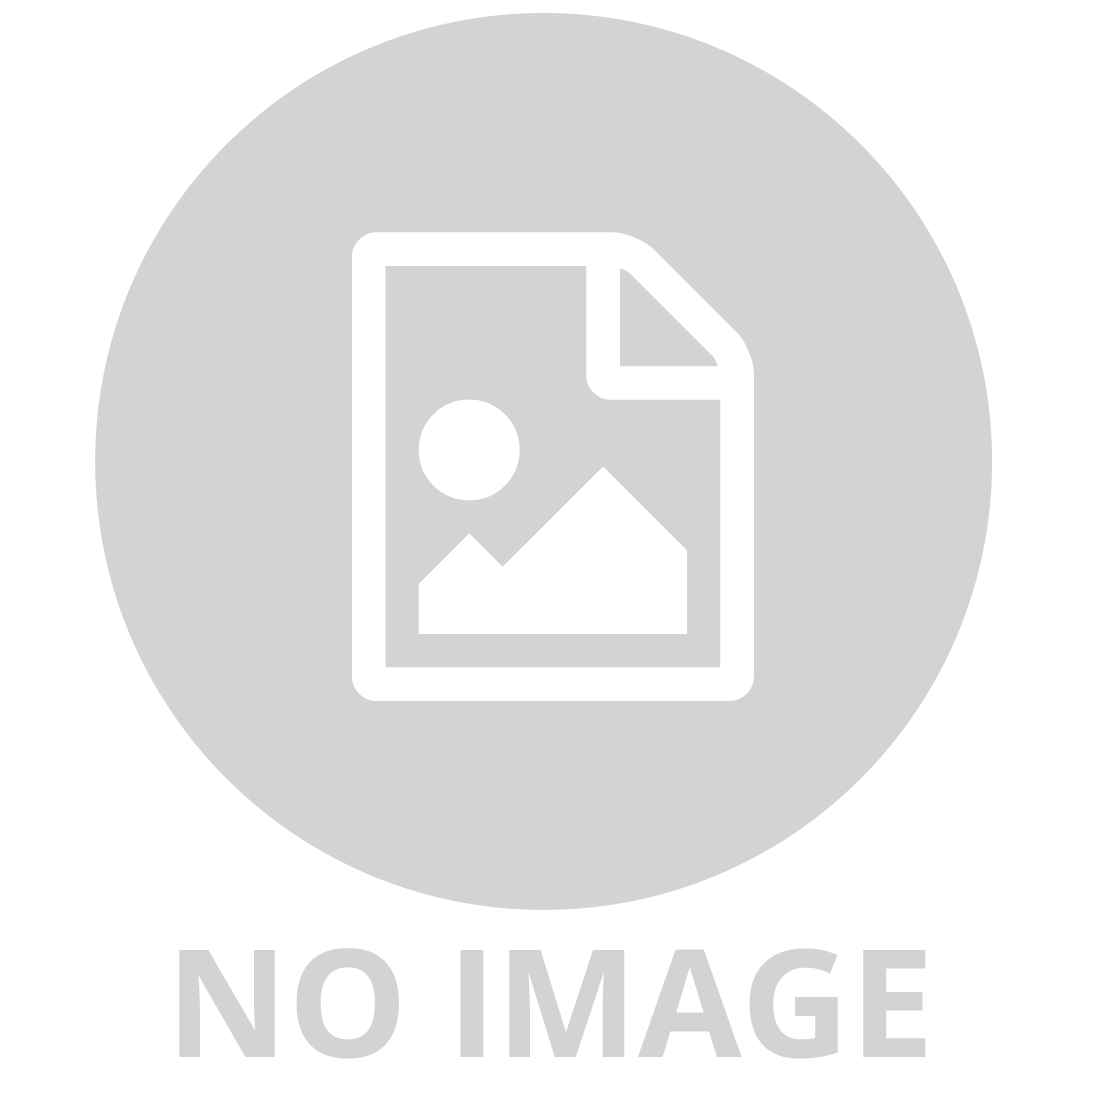 GEORGIE BLACK NEWBORN BABY